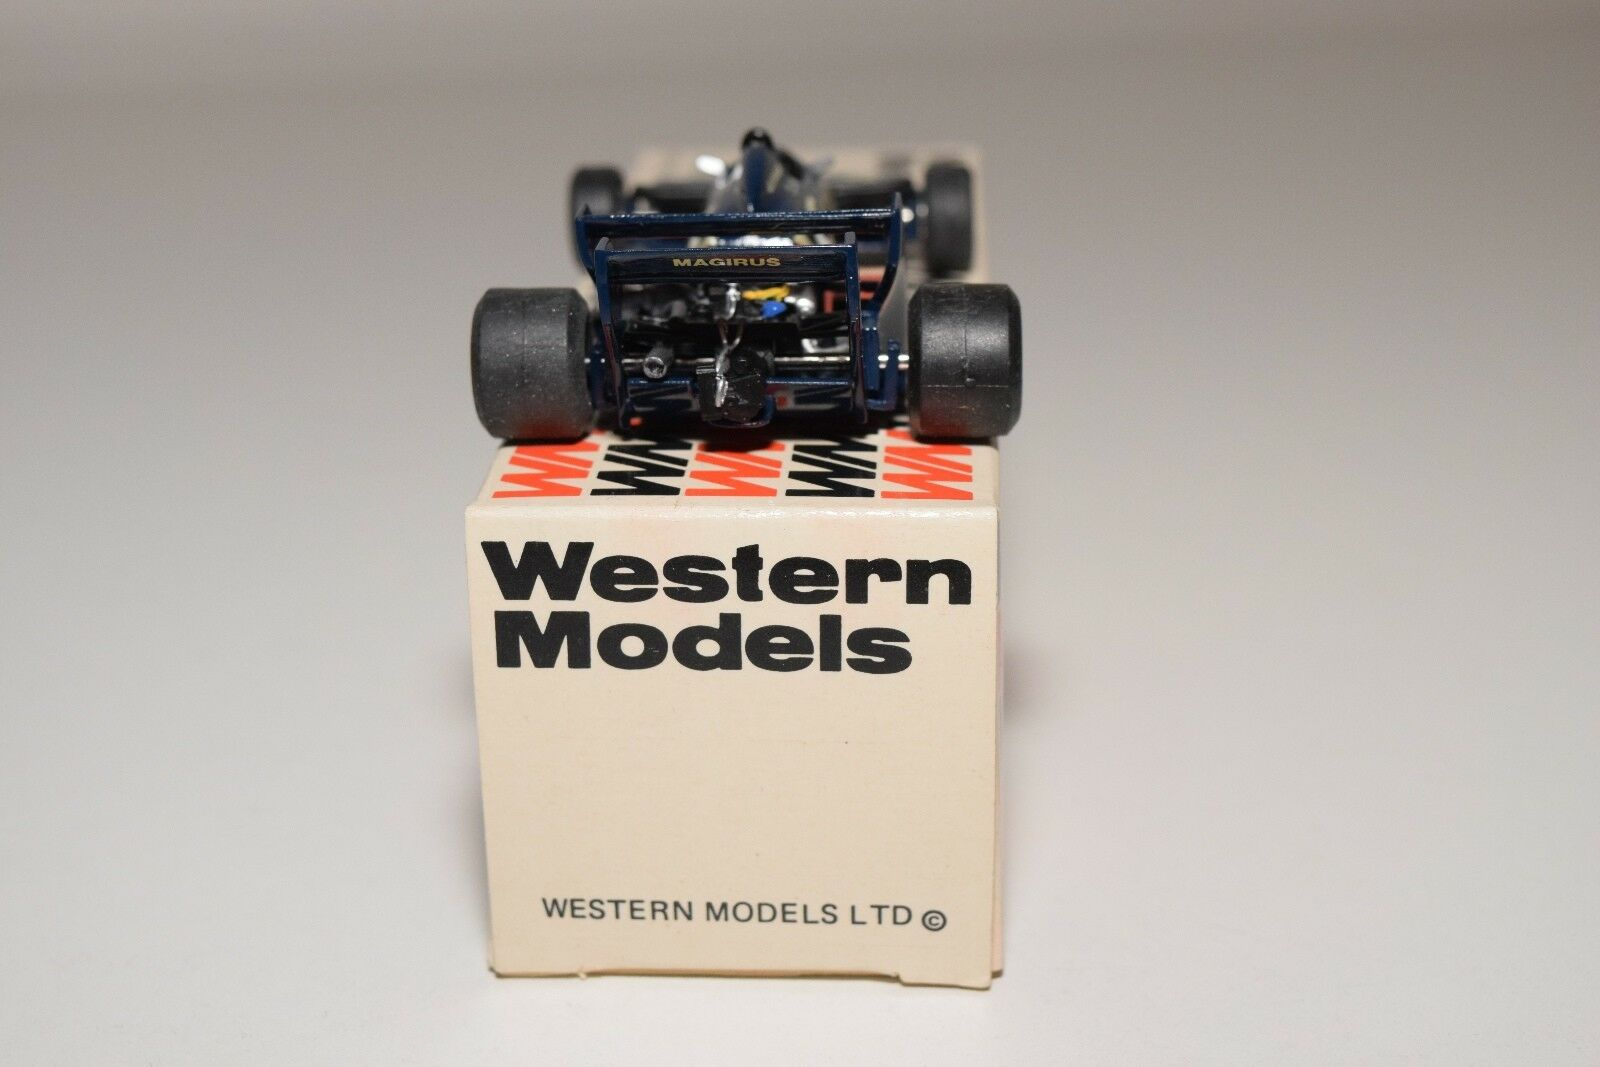 I WESTERN MODELS WM WM WM WRK39 TOLEMAN TG 183 CANDY RACING CAR DARK blueE MINT BOXED 81e4d0